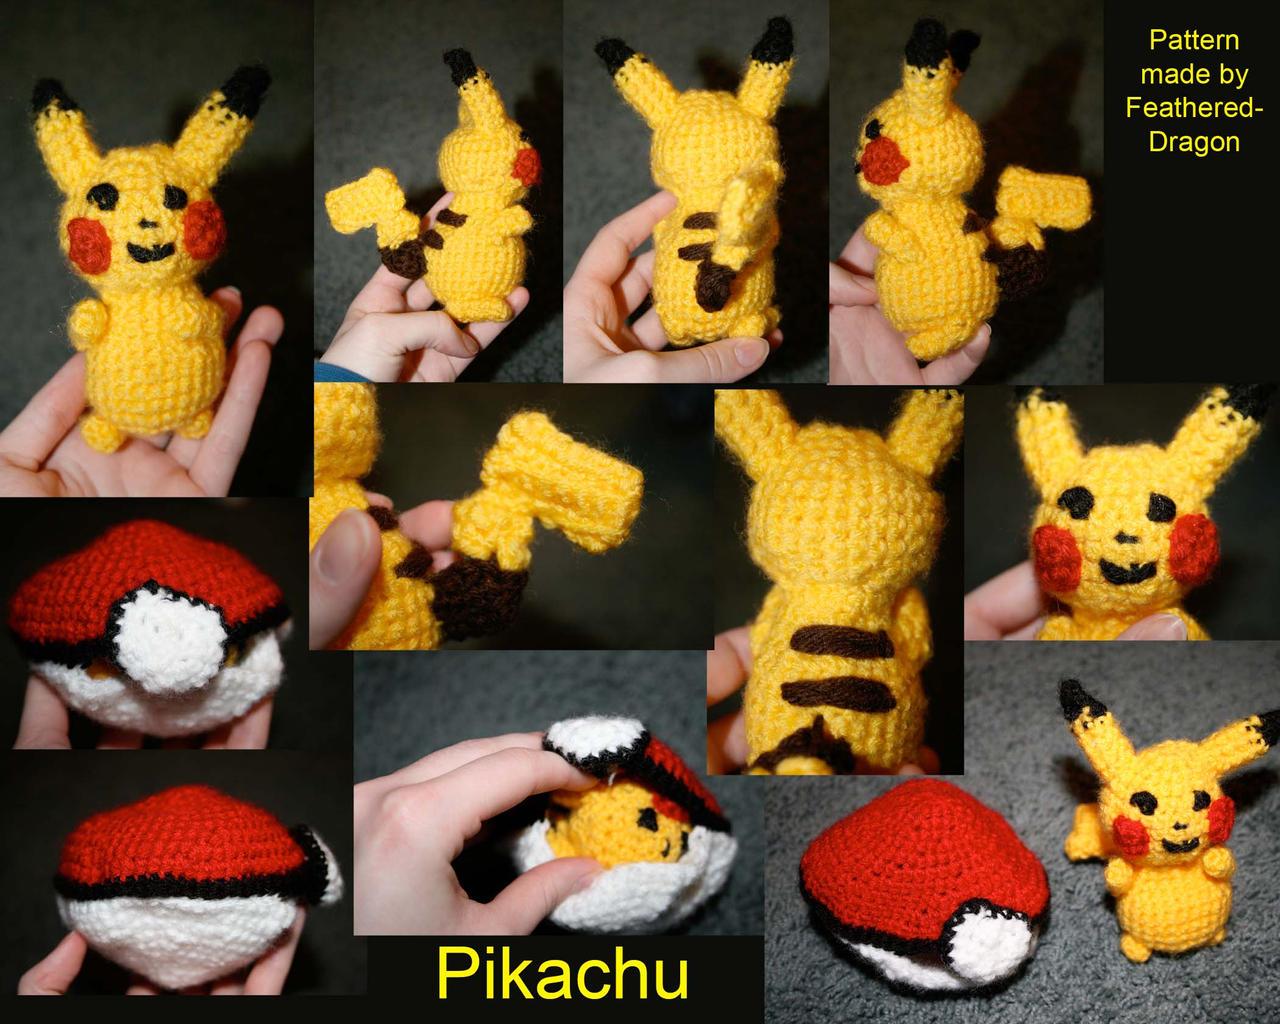 Crochet Pattern For Pikachu : Crochet Pikachu by FeatheredDragon on DeviantArt